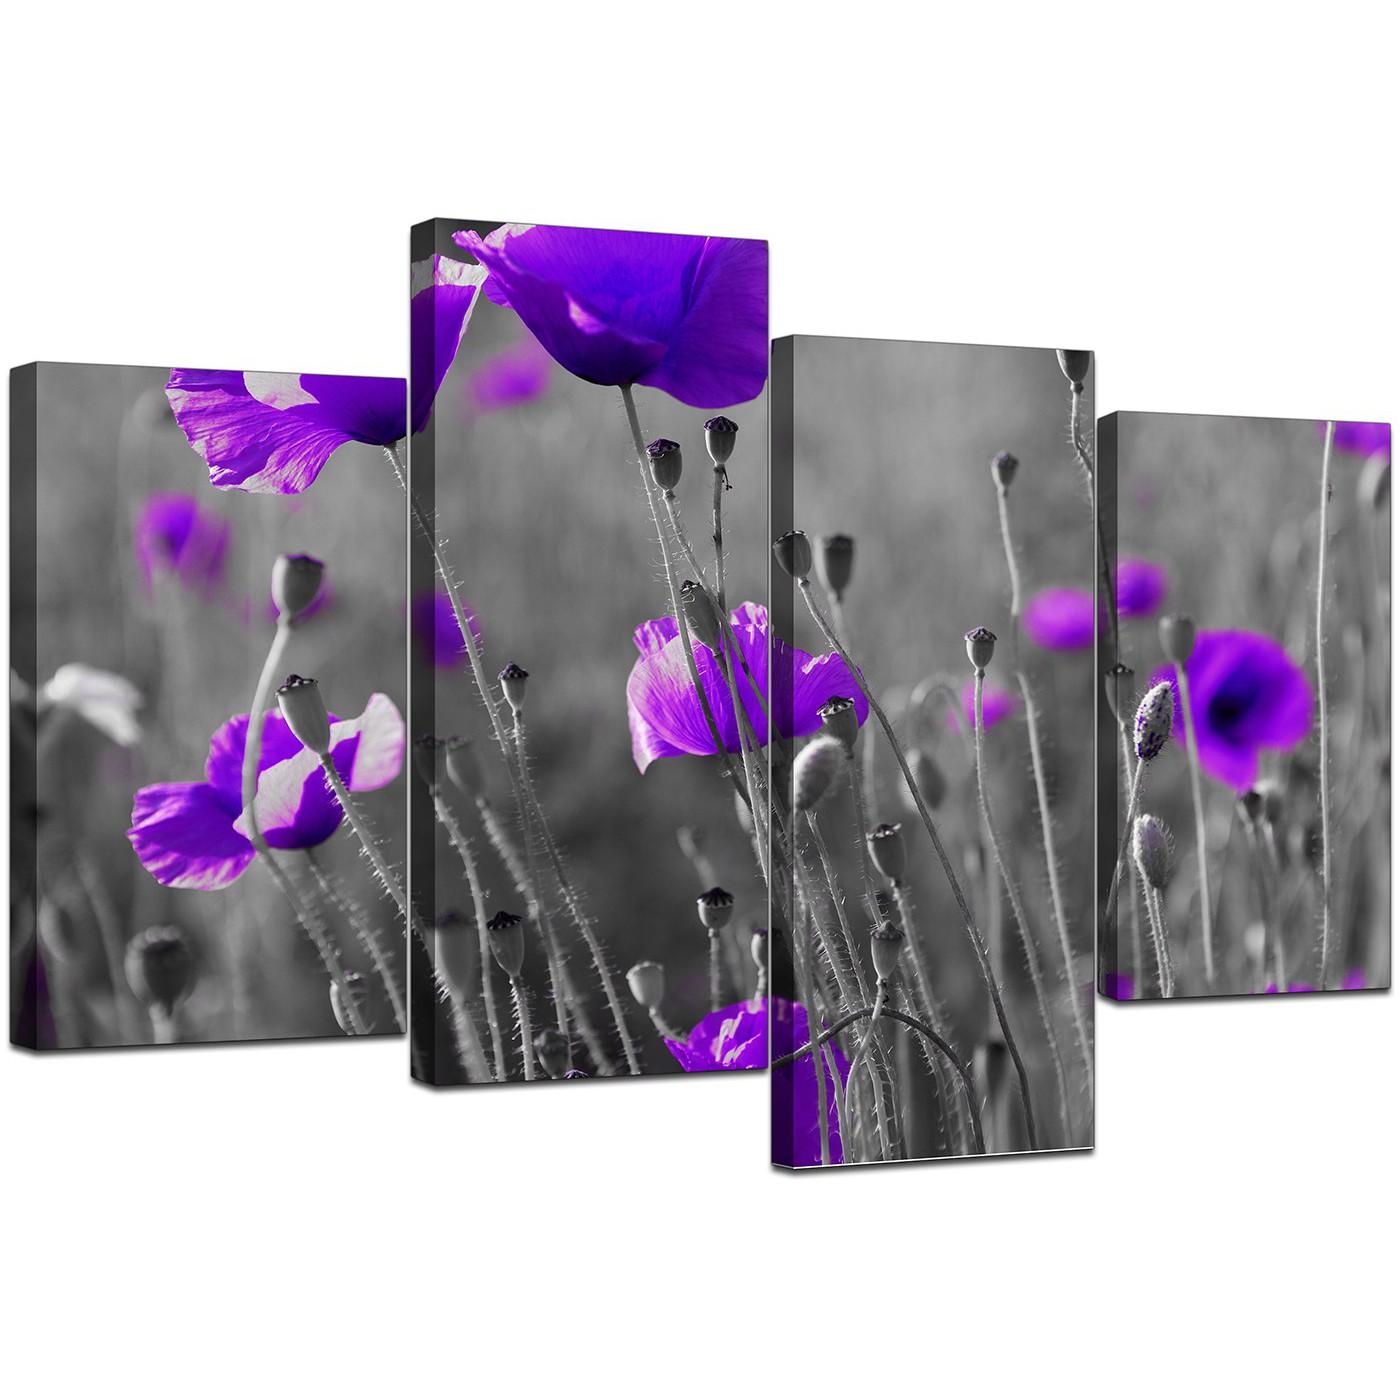 Set of 4 extra large purple canvas art display gallery item 1